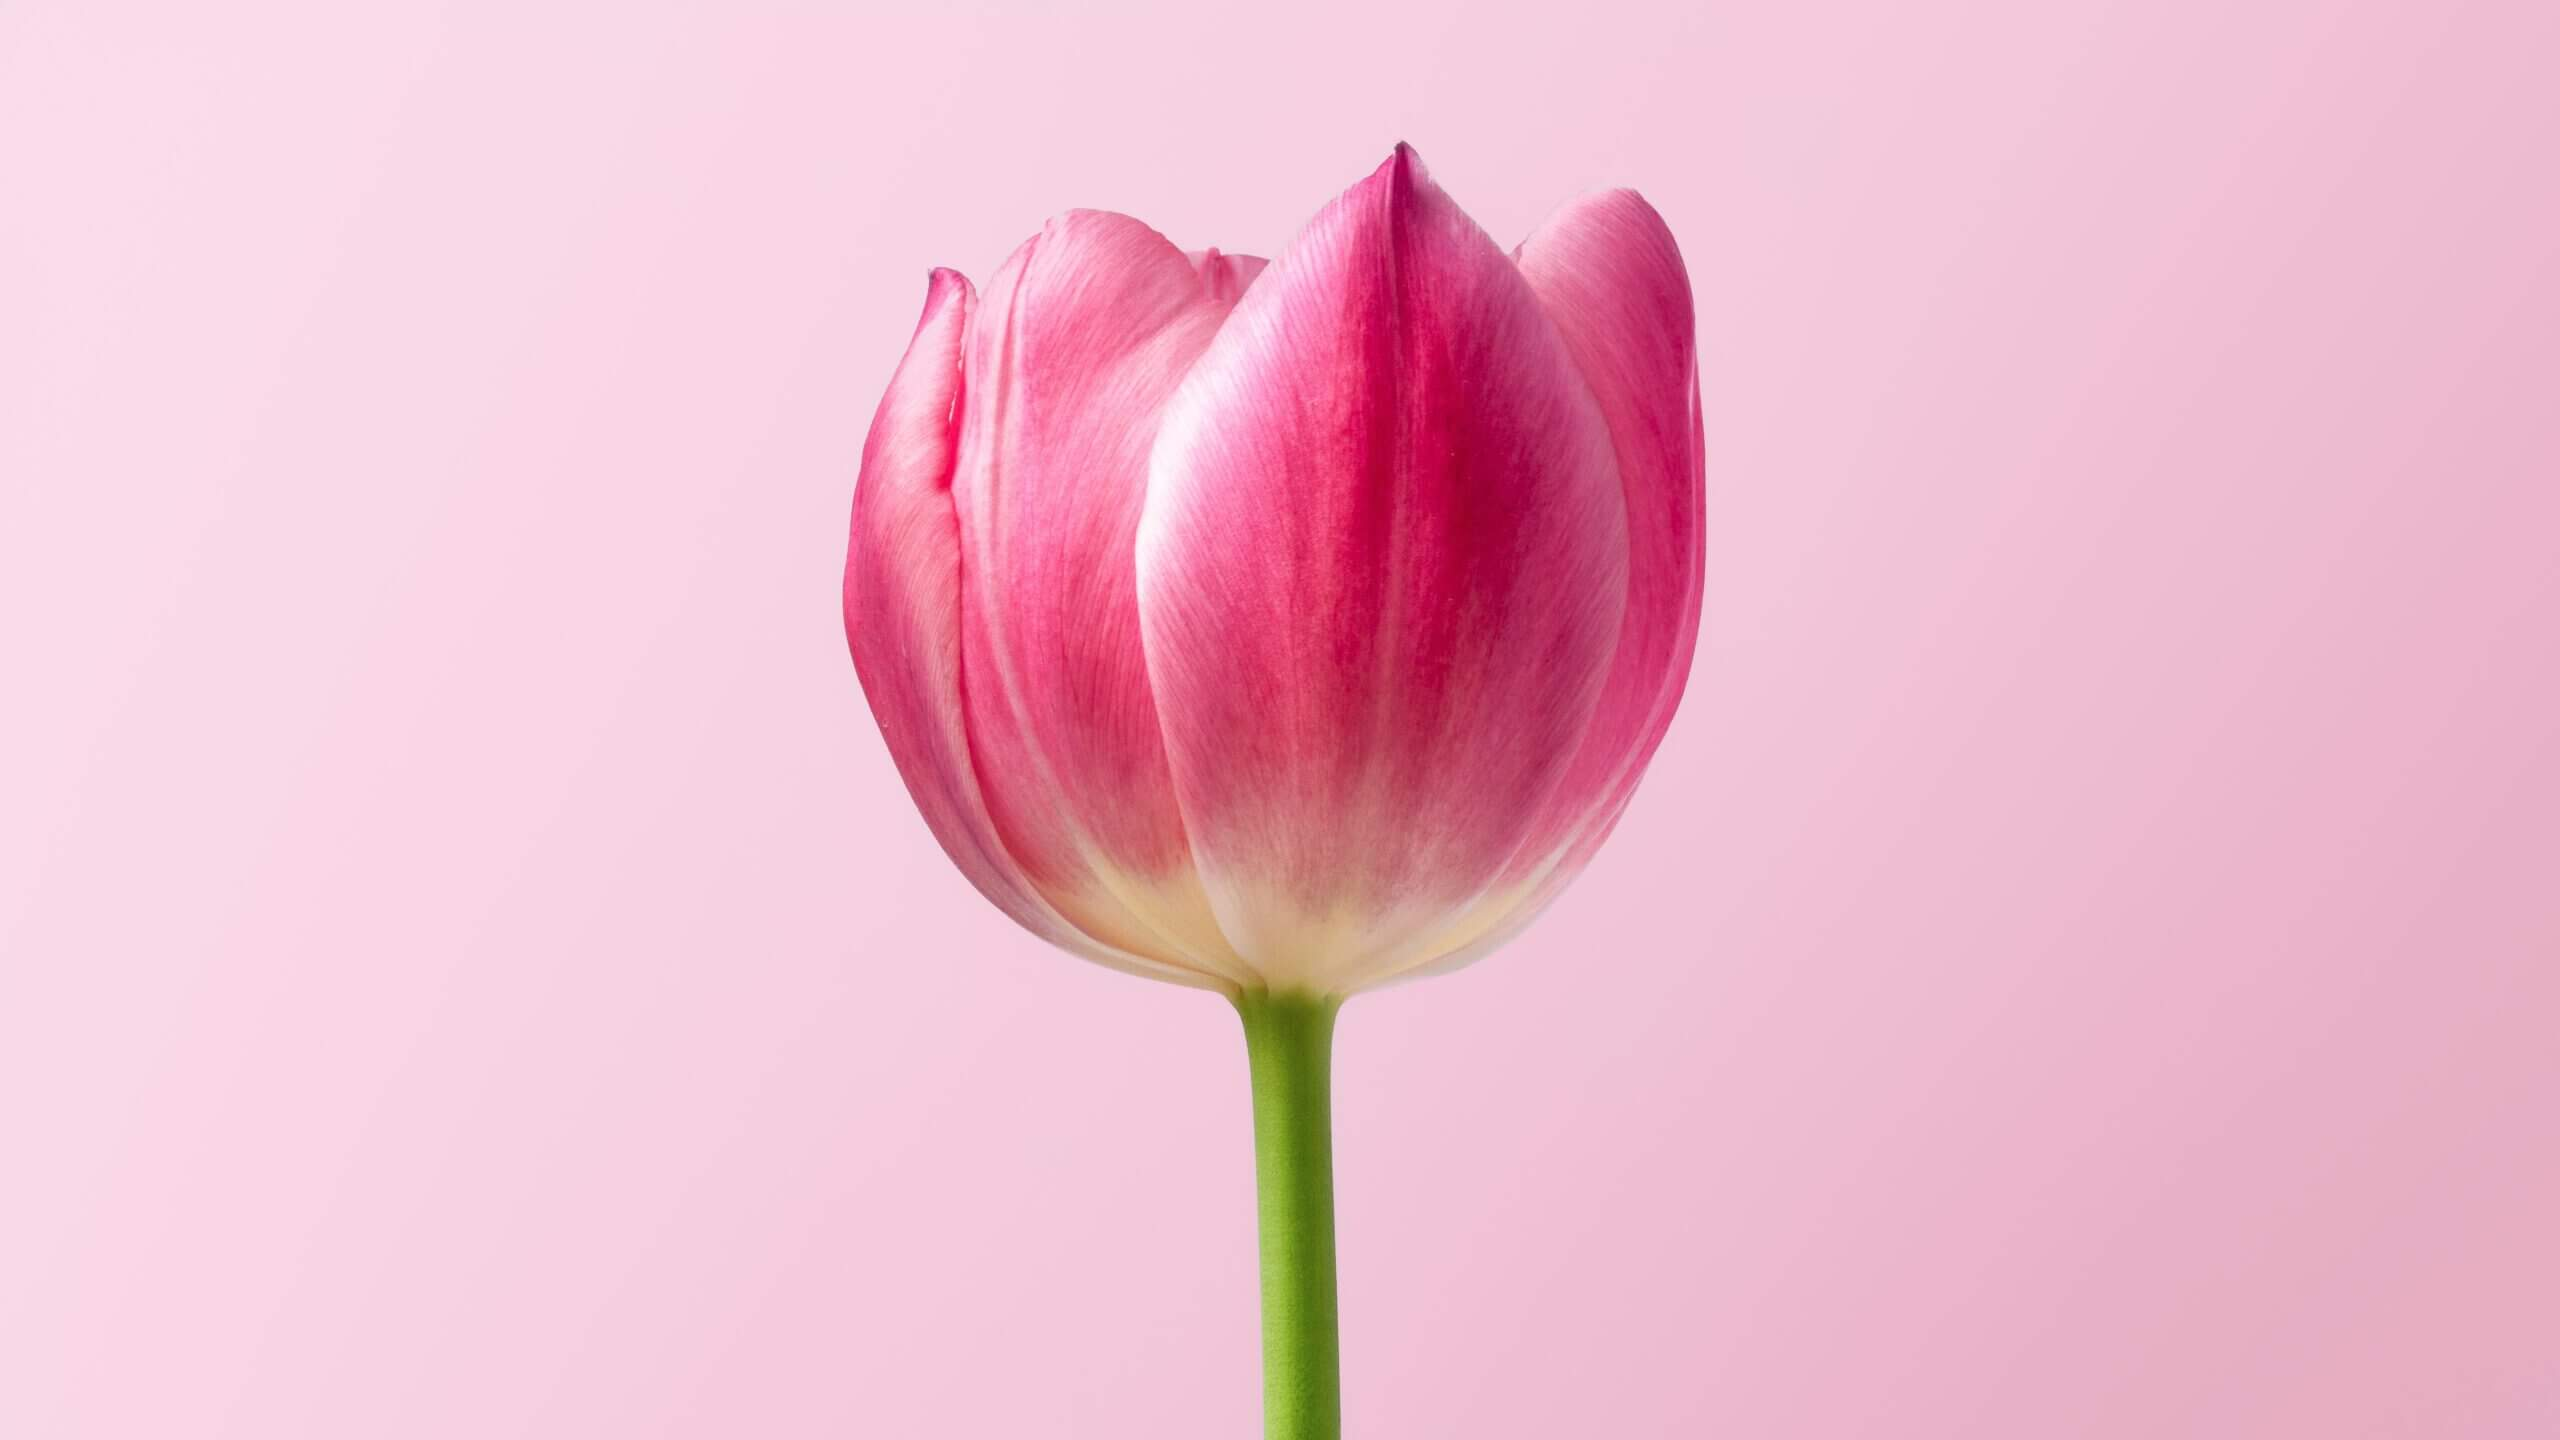 Roze tulp op roze achtergrond.